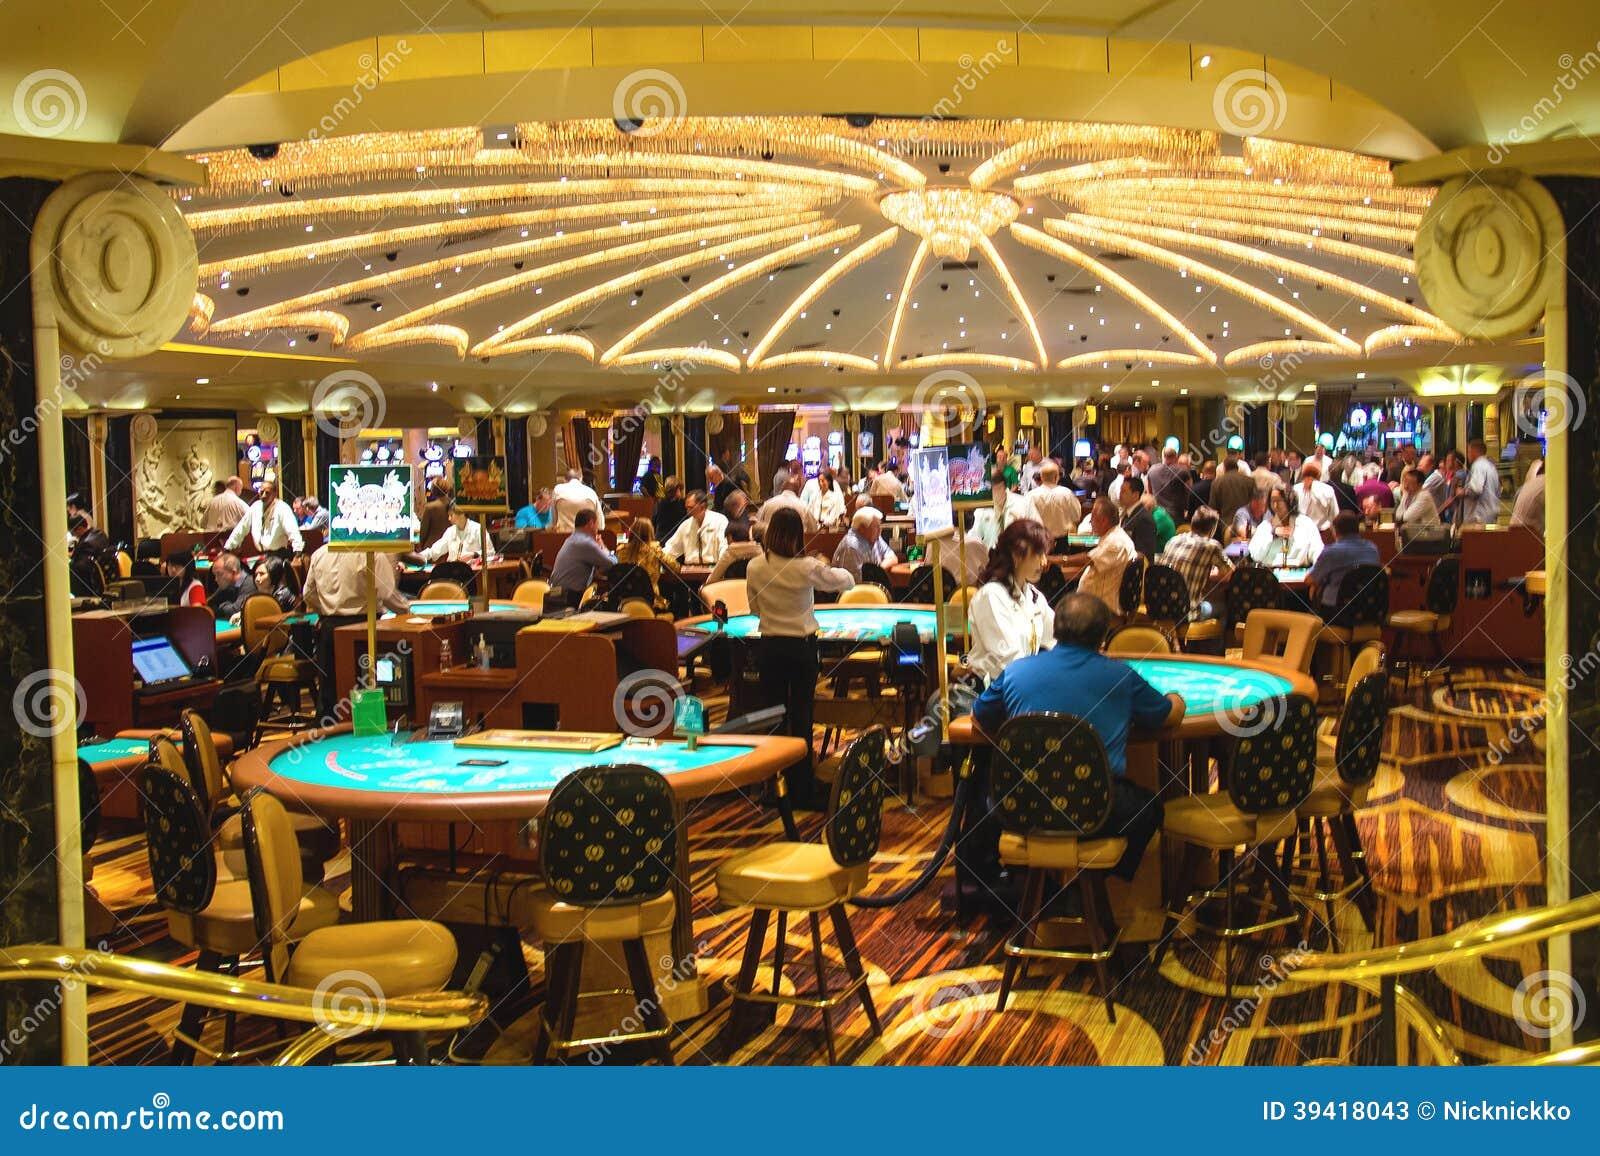 Cesears casino in best gambling las vegas casino